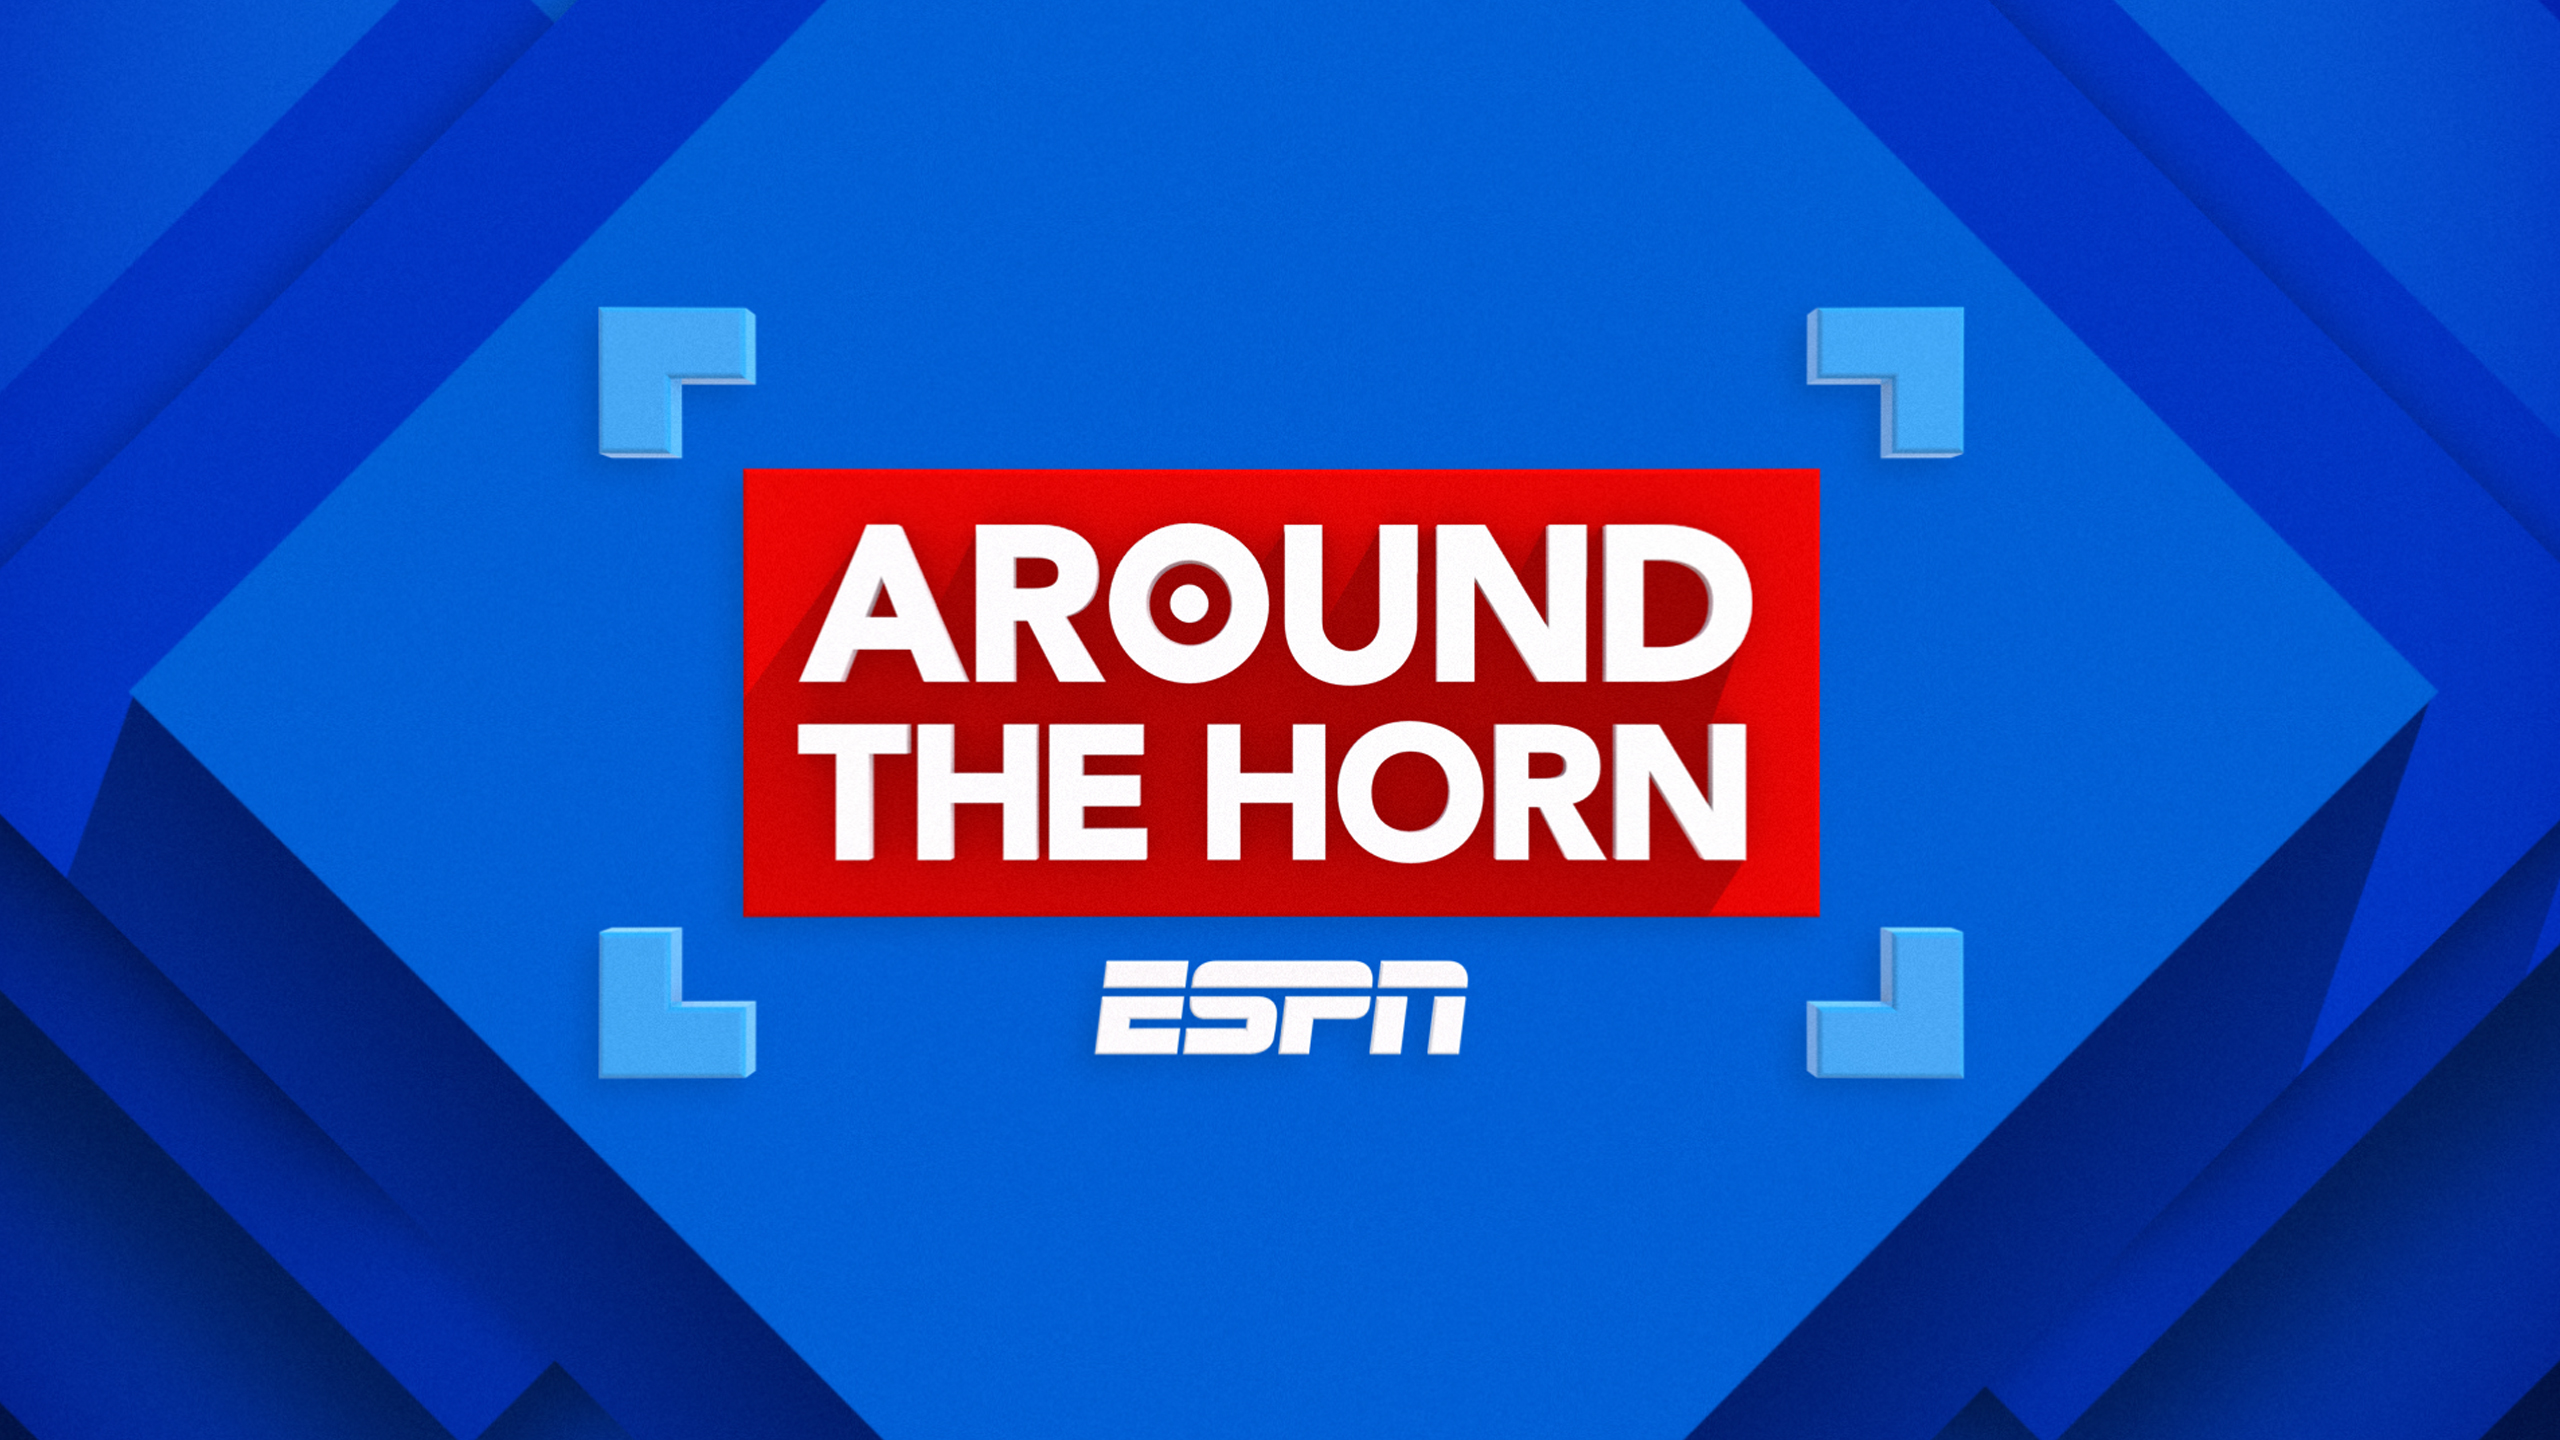 Thu, 2/21 - Around The Horn